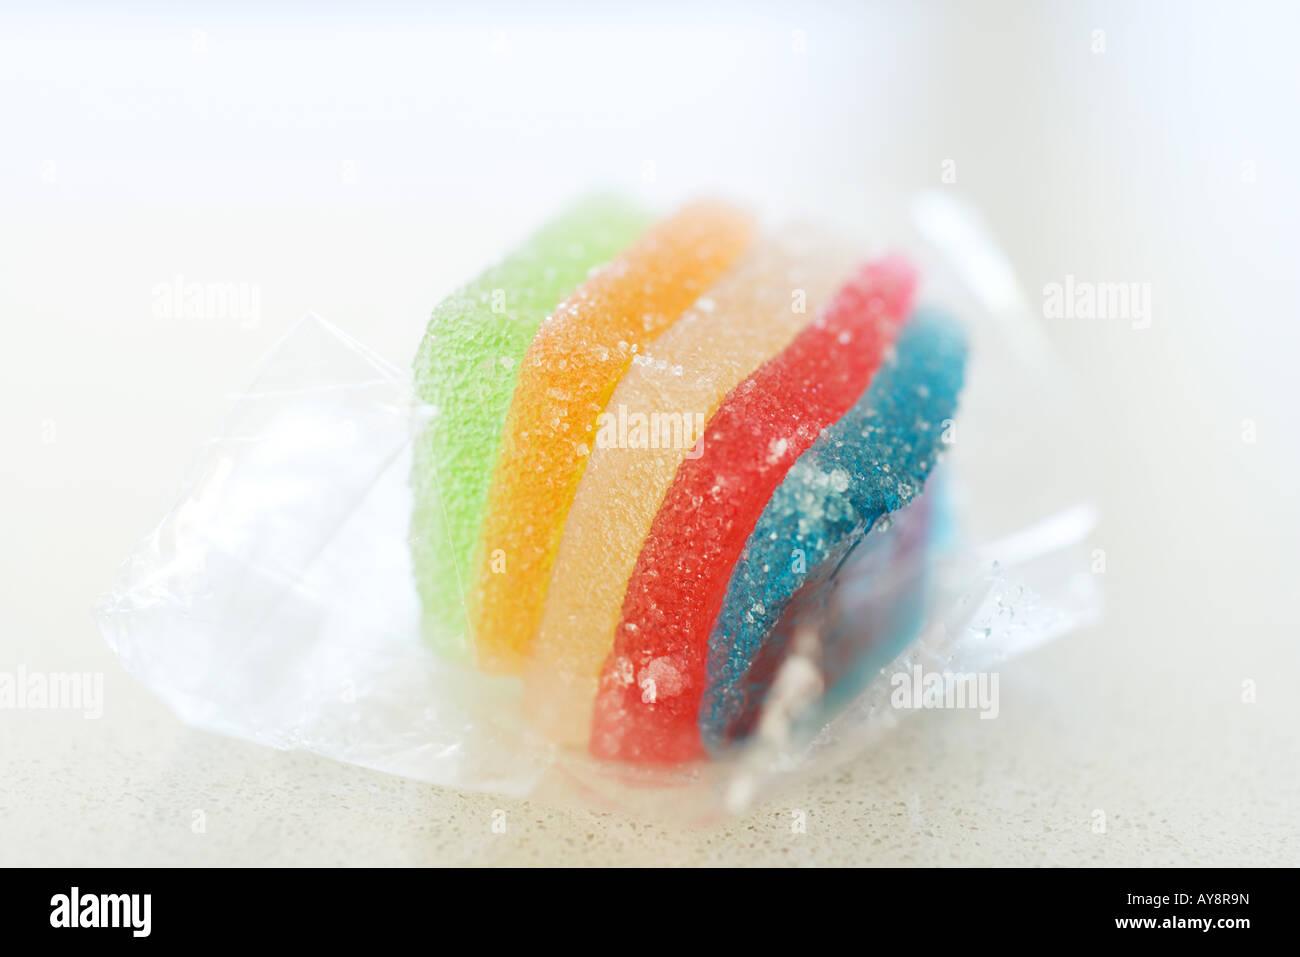 Mehrfarbige Gummibonbon Süßigkeiten, close-up Stockbild